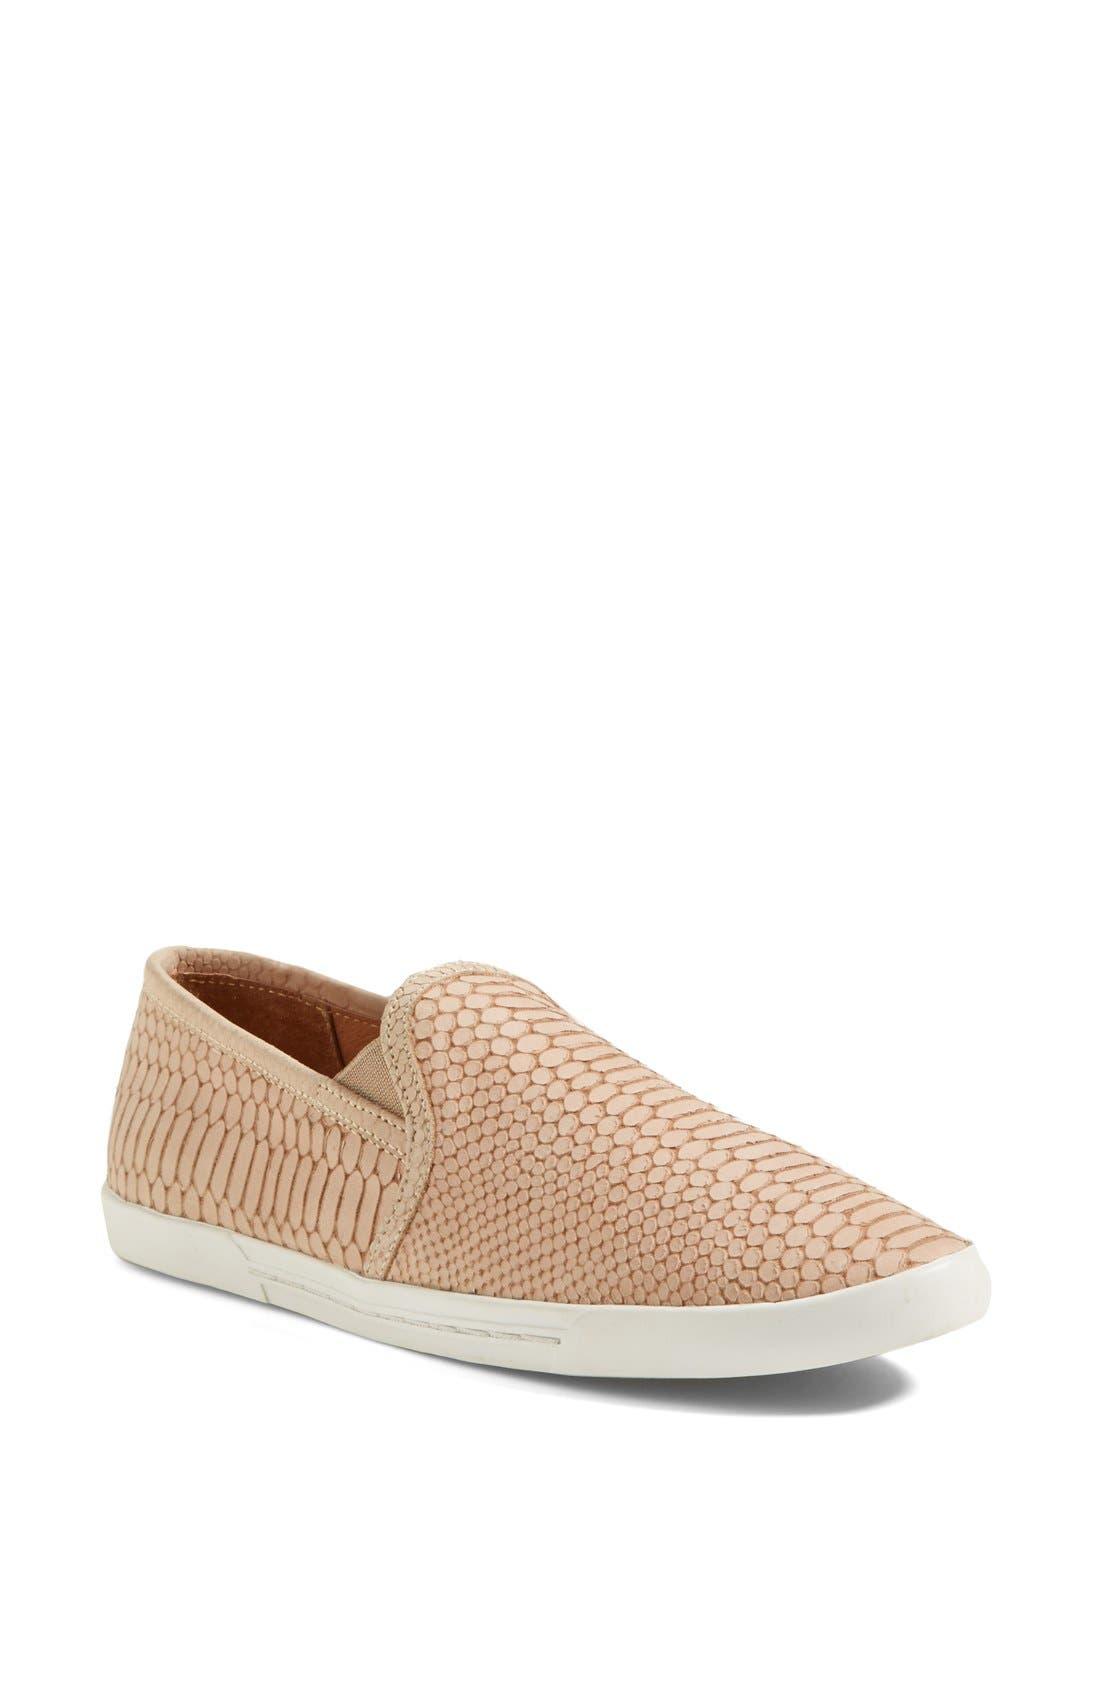 JOIE 'Kidmore' Sneaker